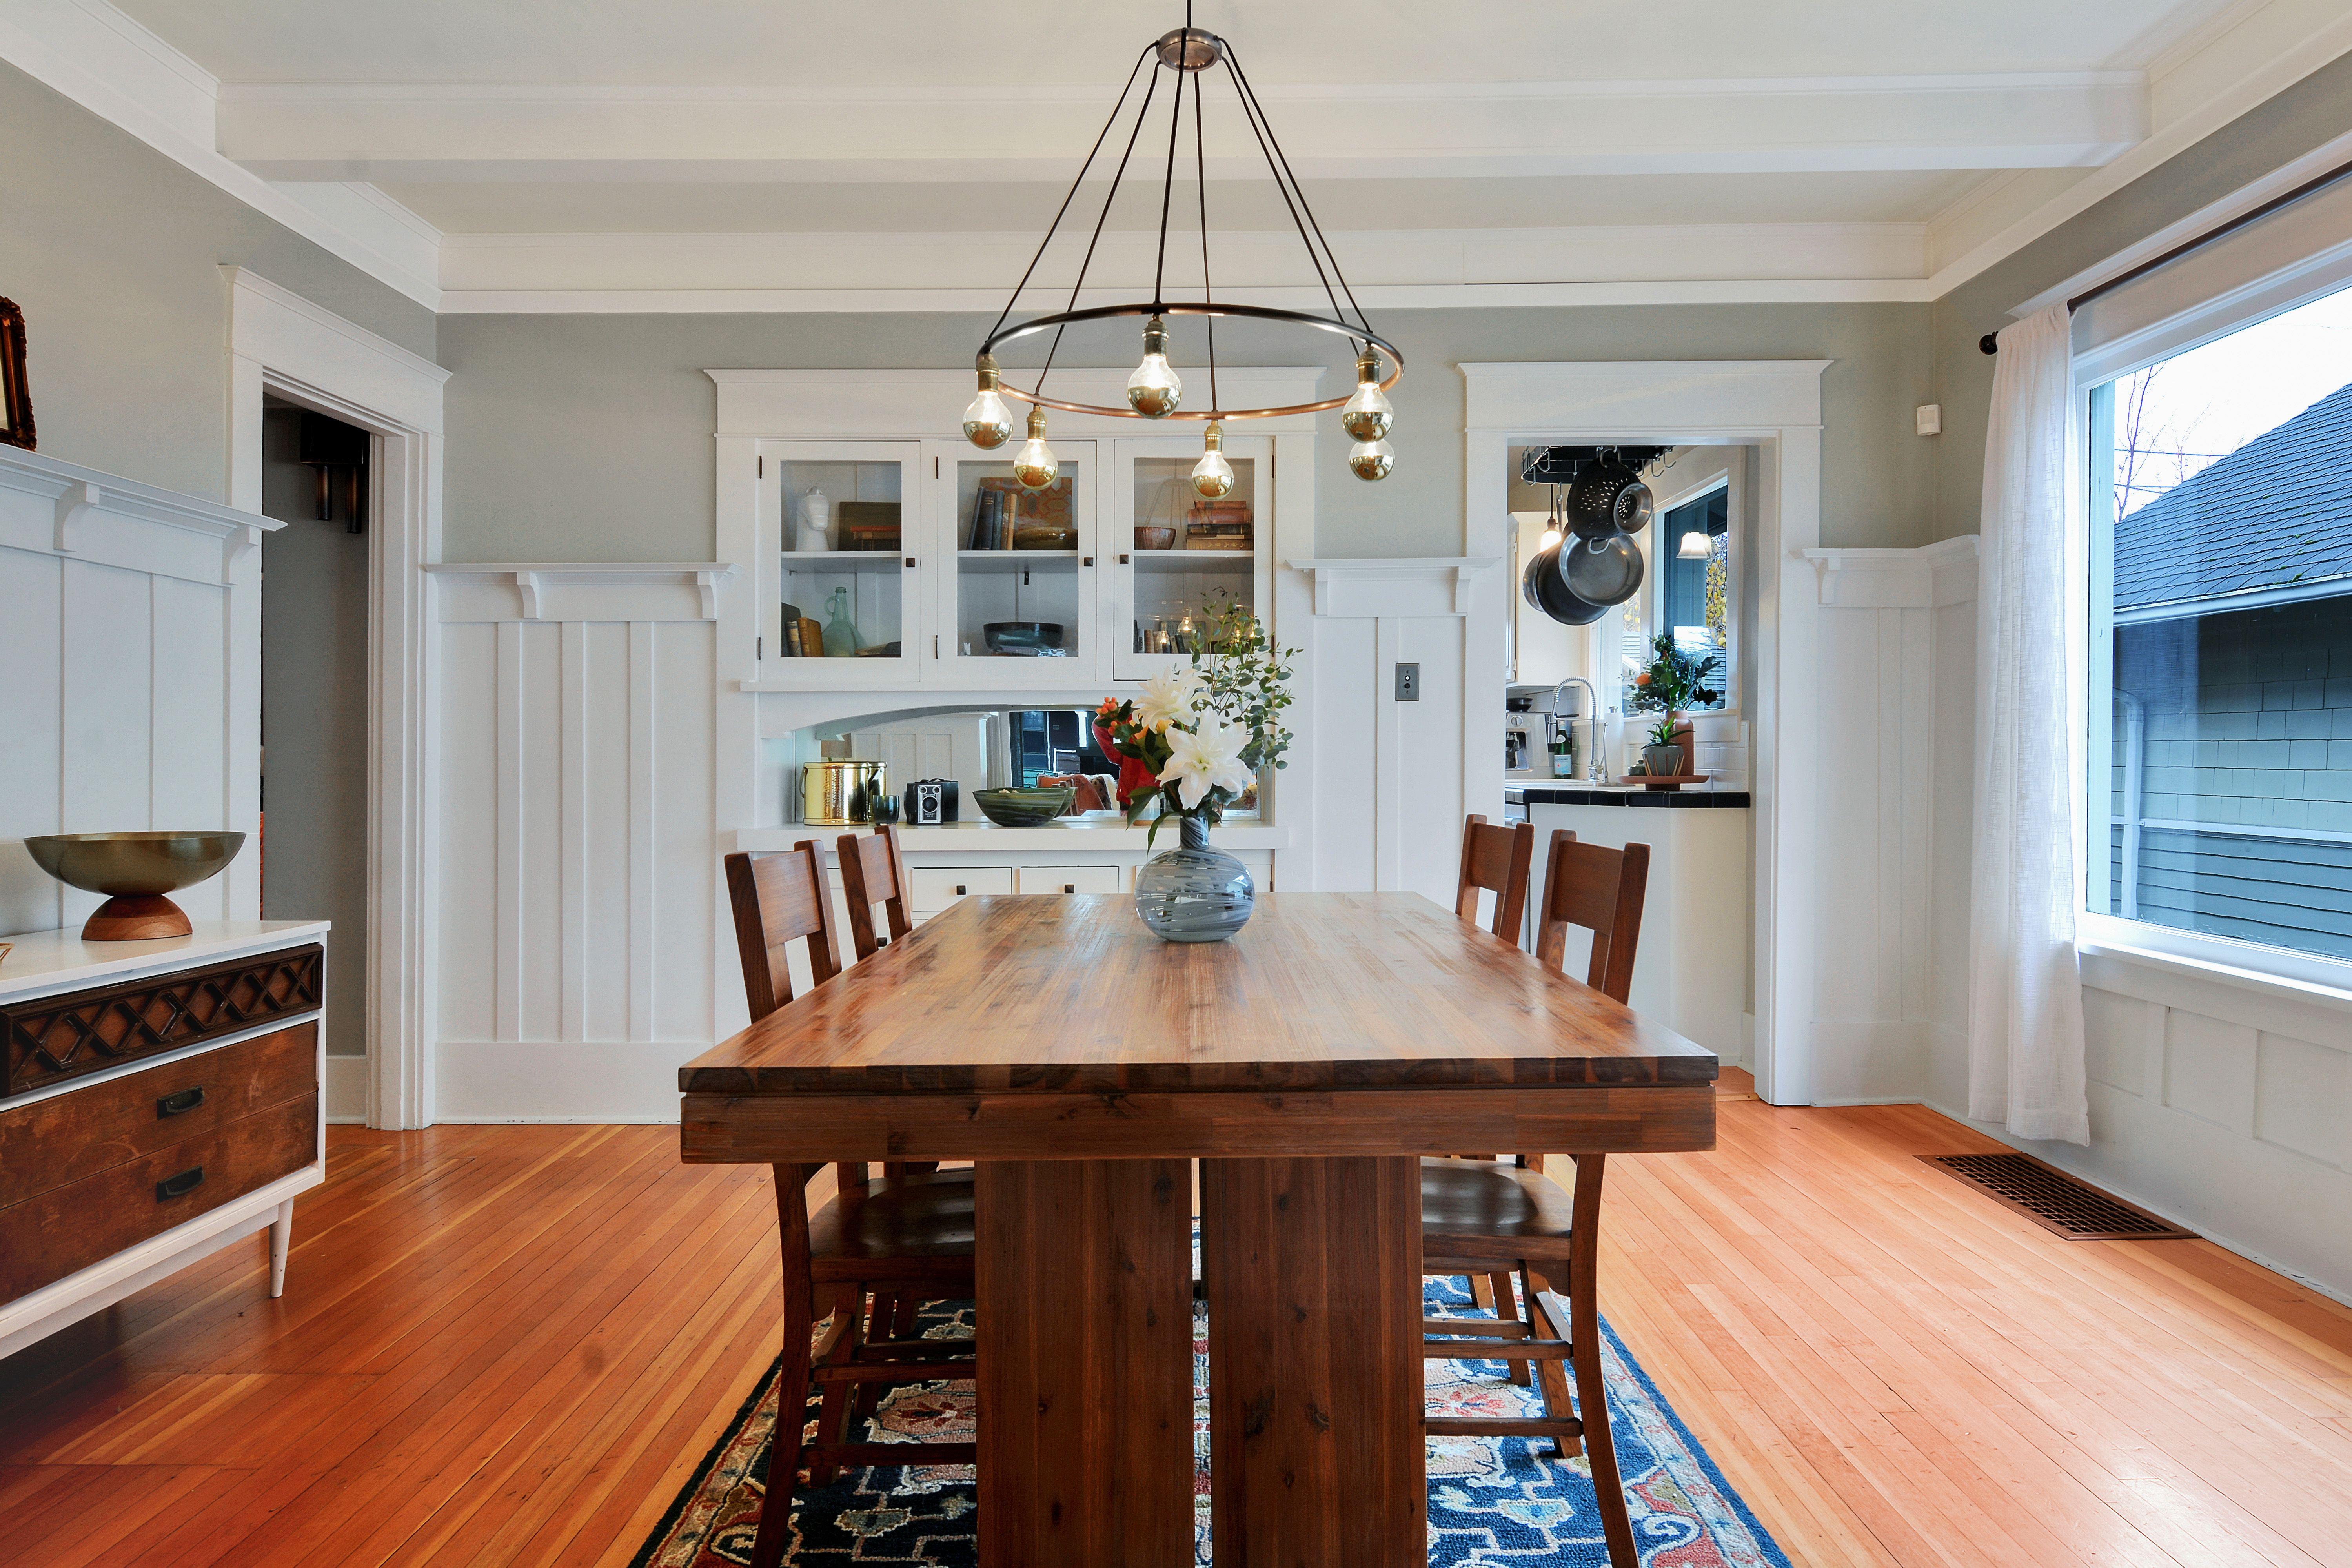 Sold Classic Craftsman Bungalow Michael Duggan Tacoma Homes Craftsman Dining Room Craftsman Bungalow Interior Bungalow Dining Room